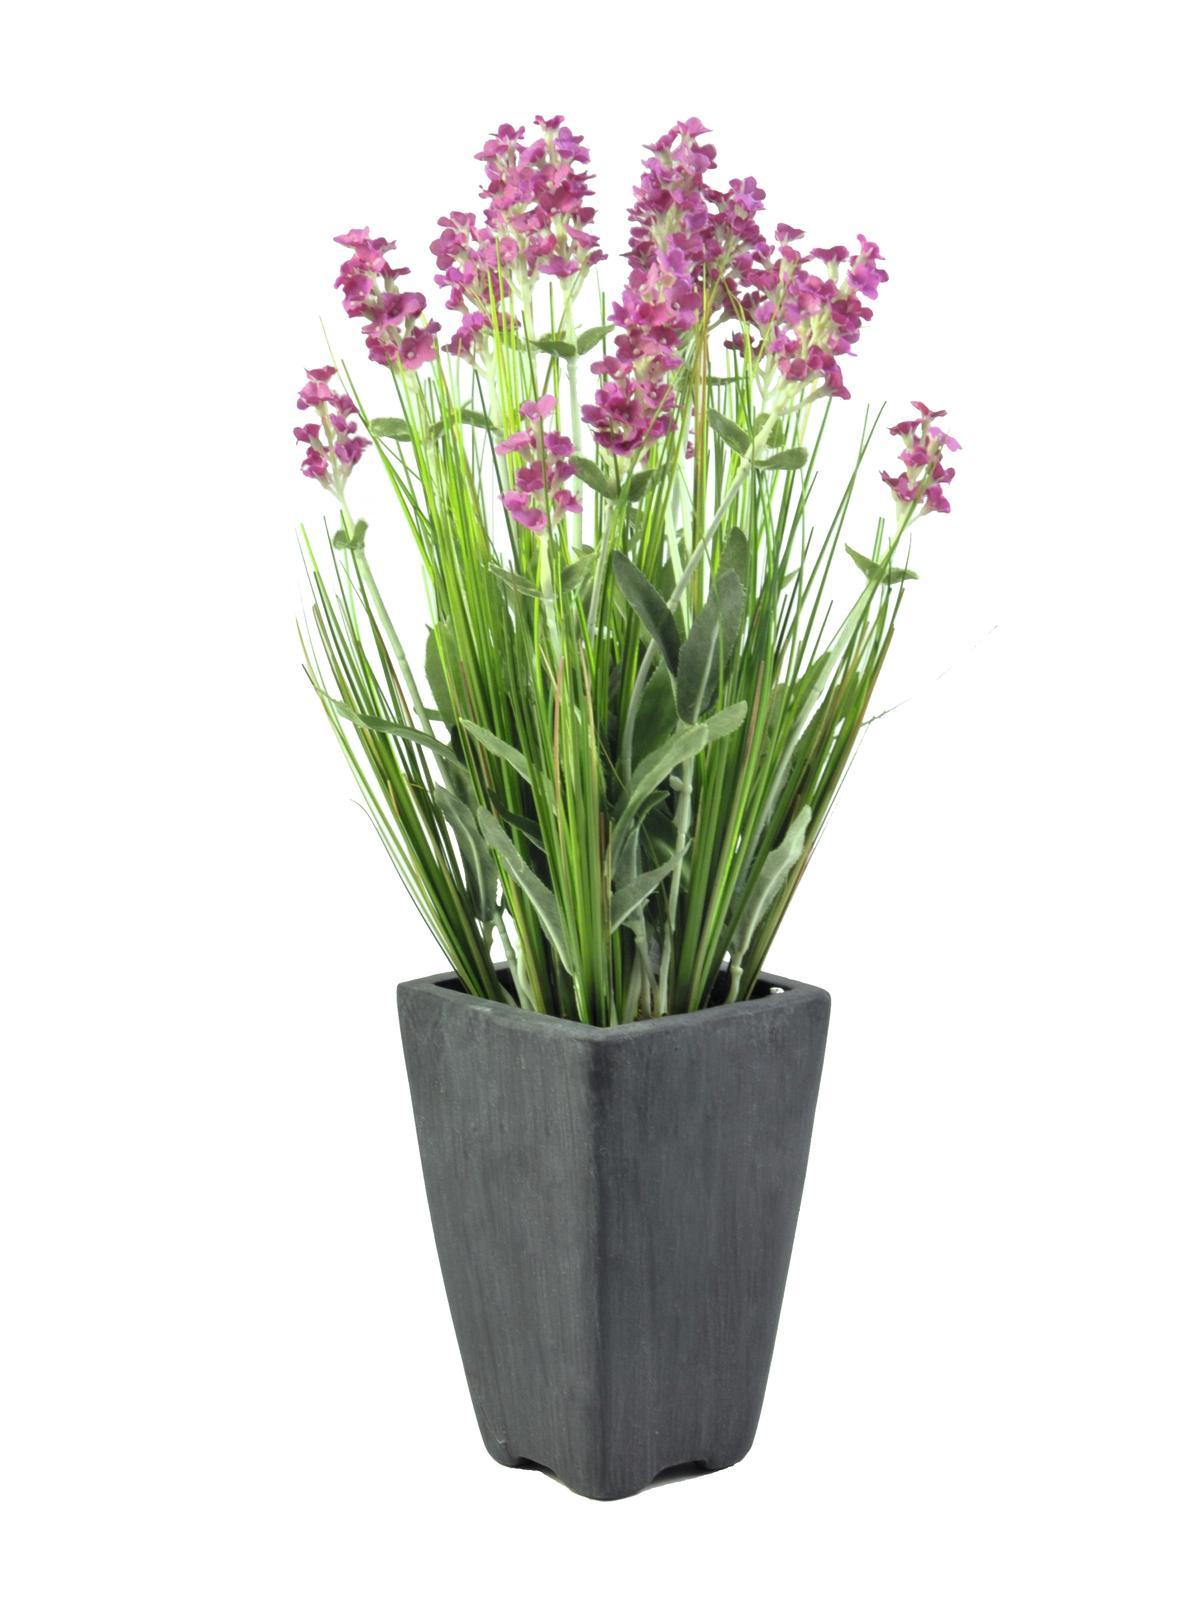 EUROPALMS Lavendel, kunstpflanze, rosé, im Dekotopf, 45cm